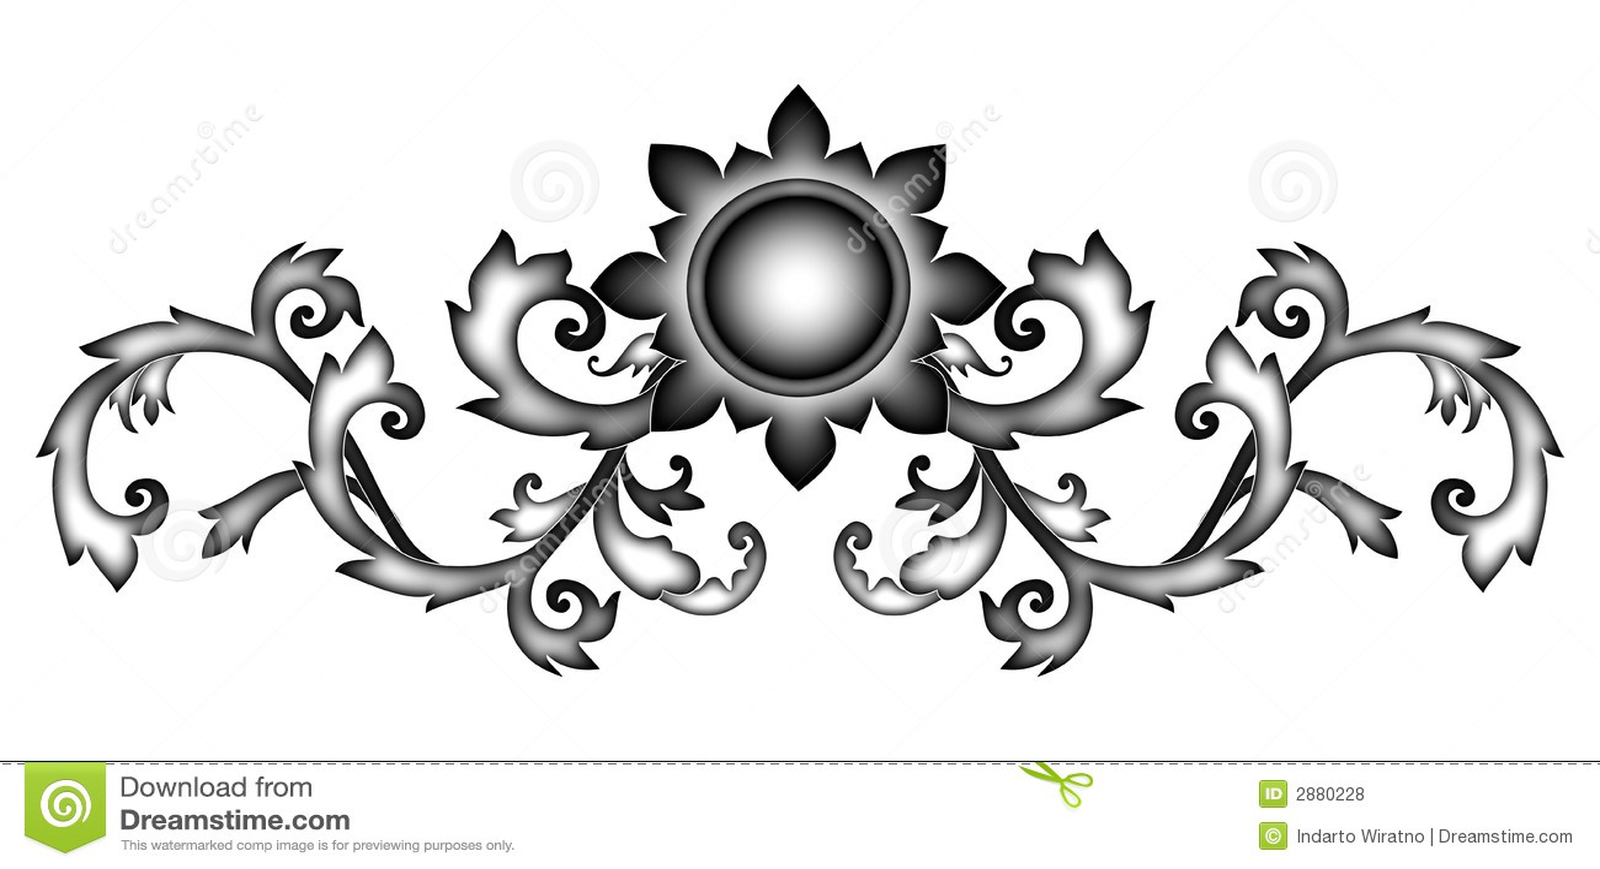 Design motif stock illustration. Illustration of formation ...